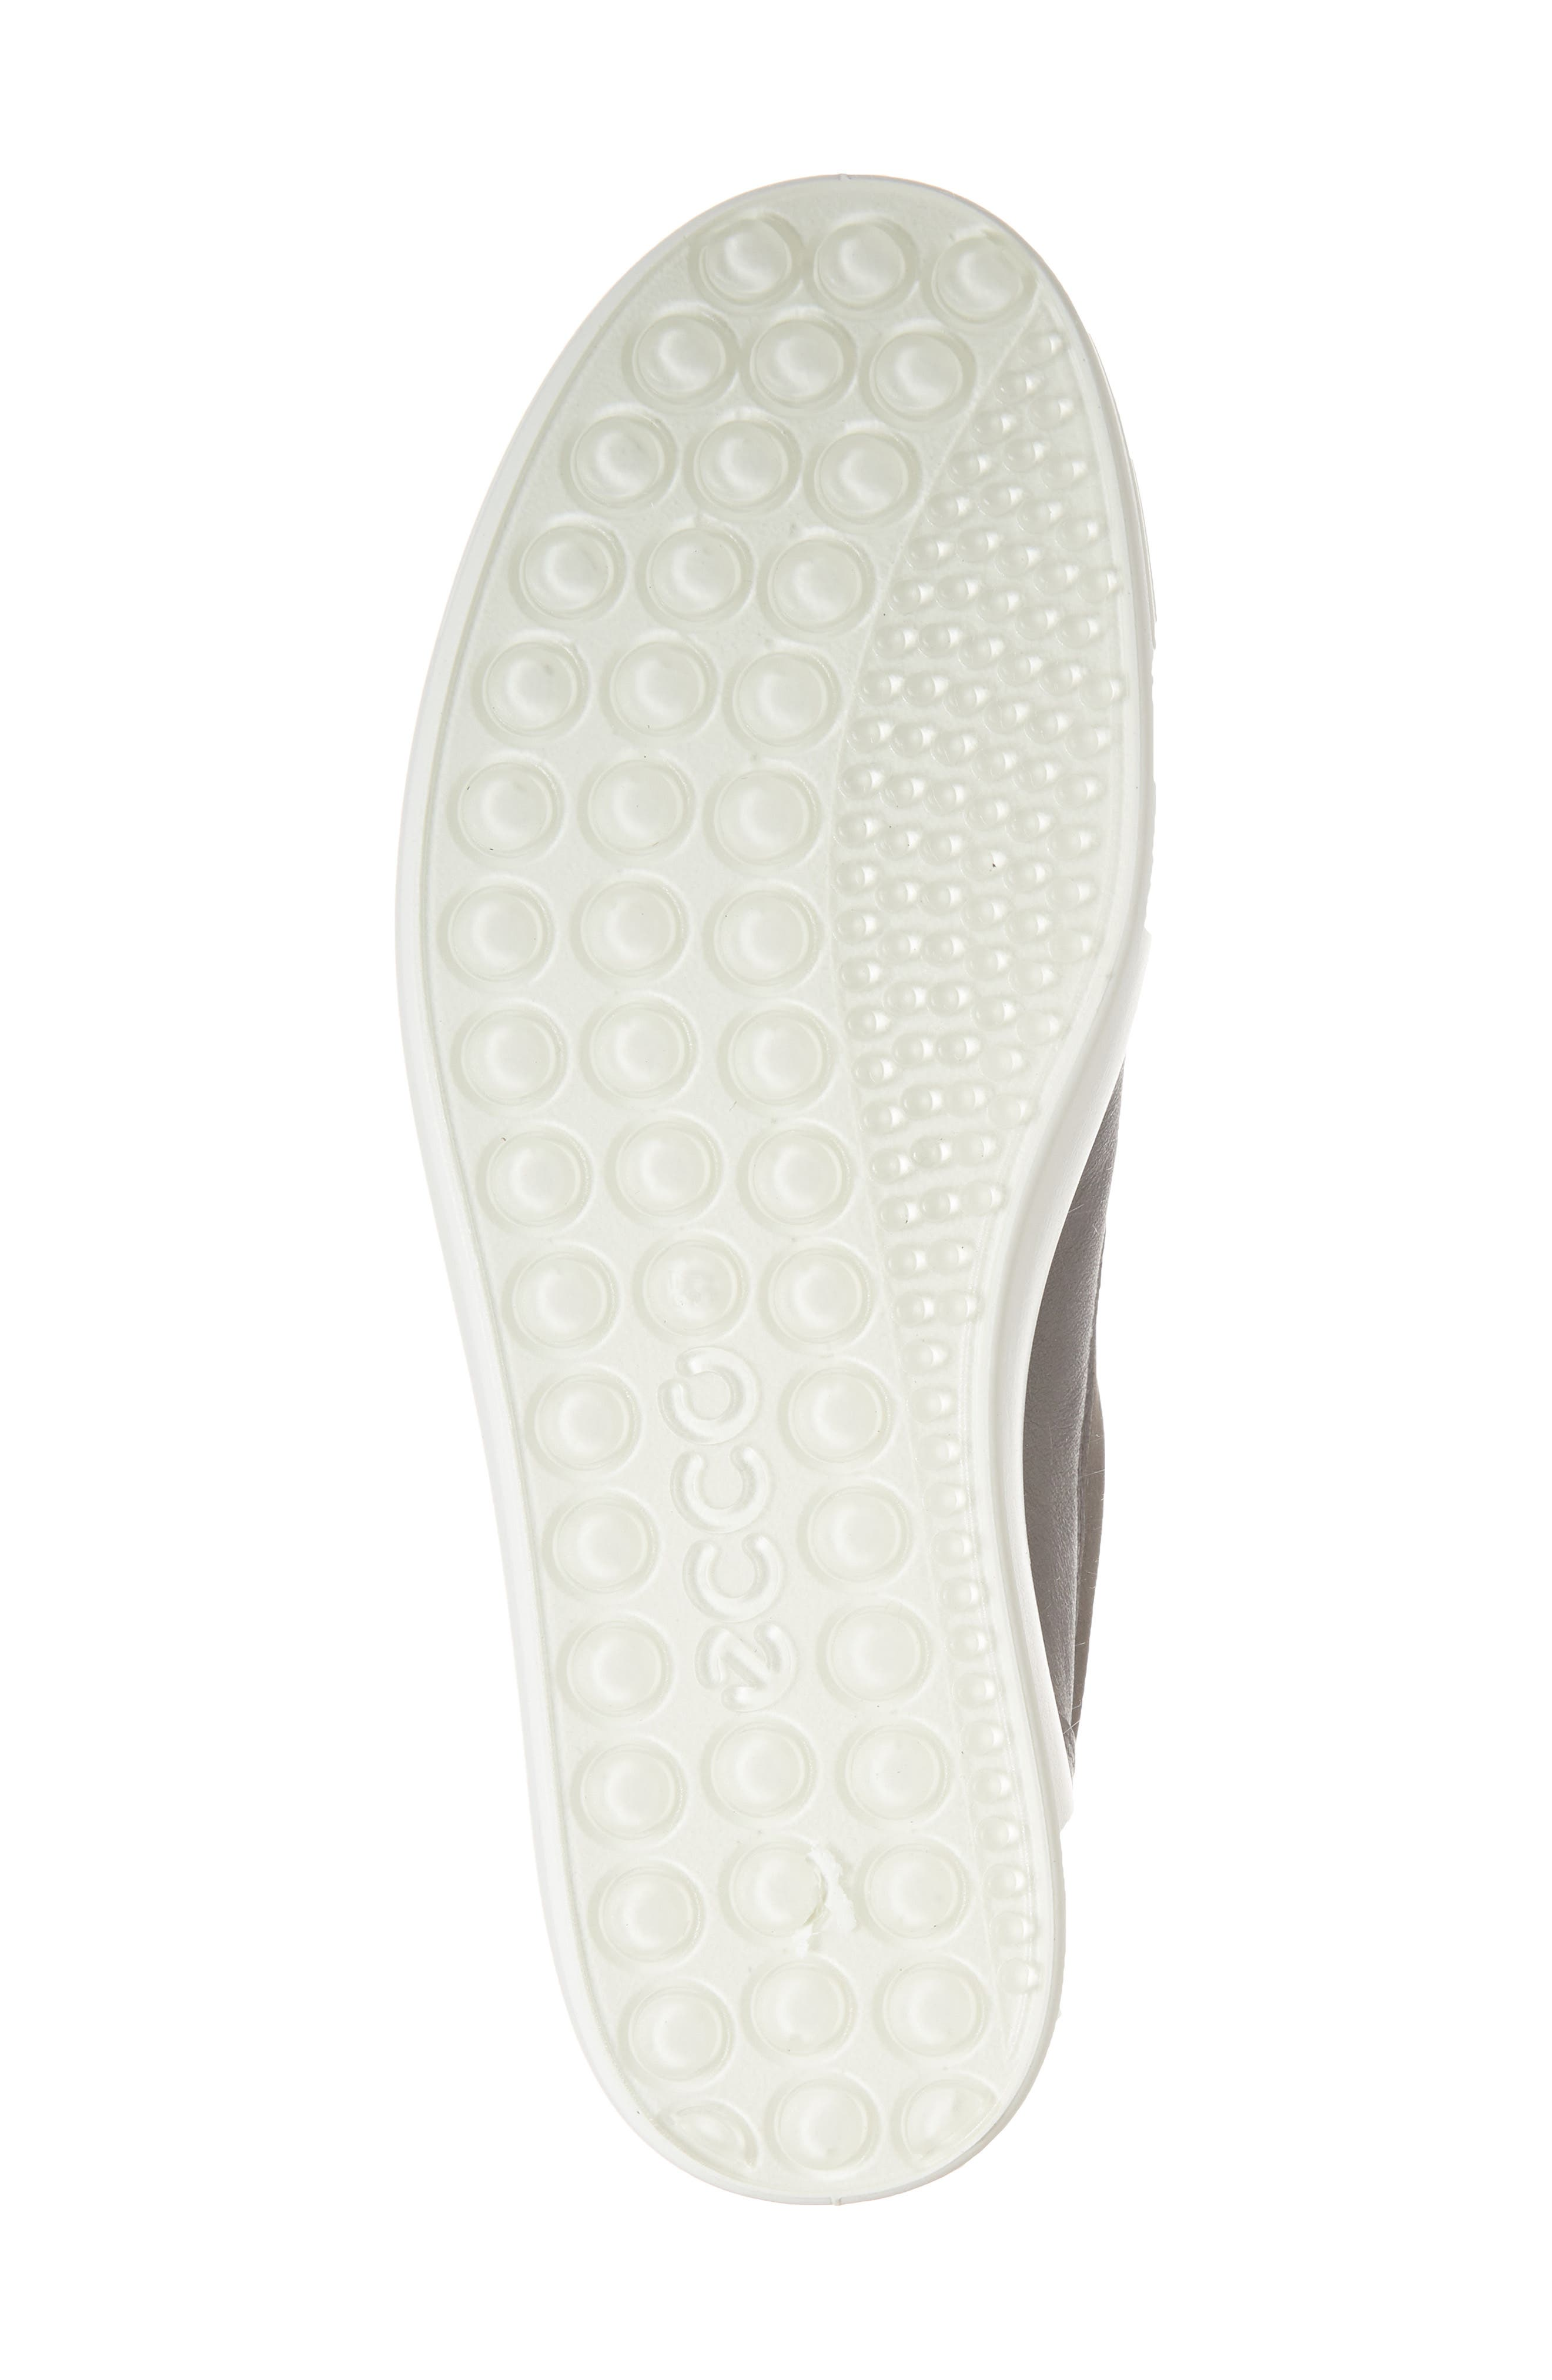 Soft 7 II Slip-On Sneaker,                             Alternate thumbnail 6, color,                             DARK SHADOW LEATHER